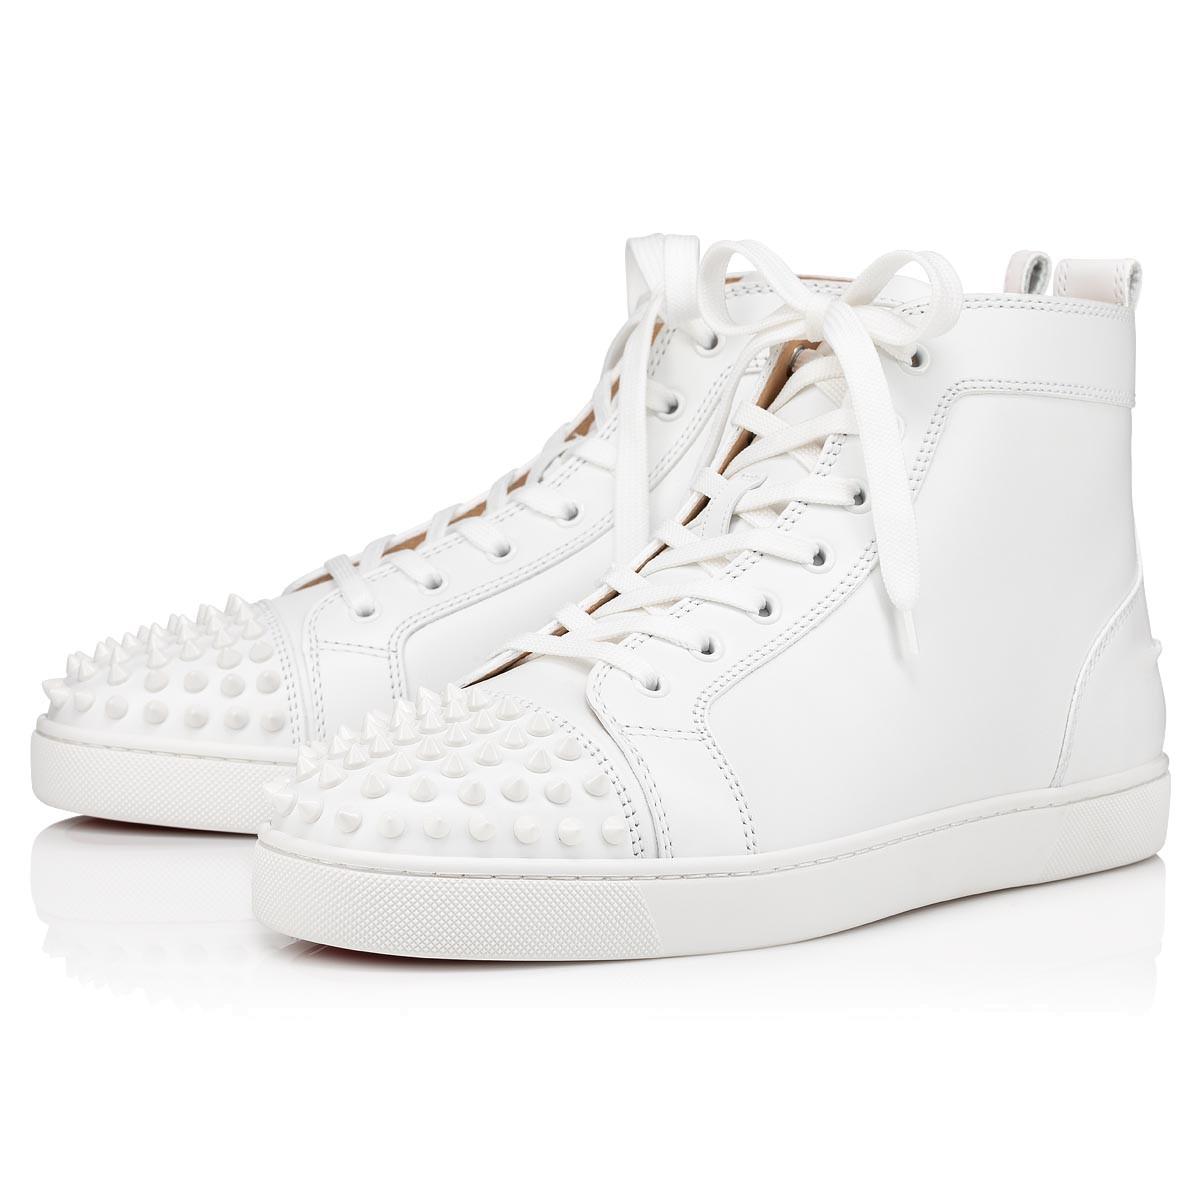 Shoes - Lou Spikes Flat - Christian Louboutin